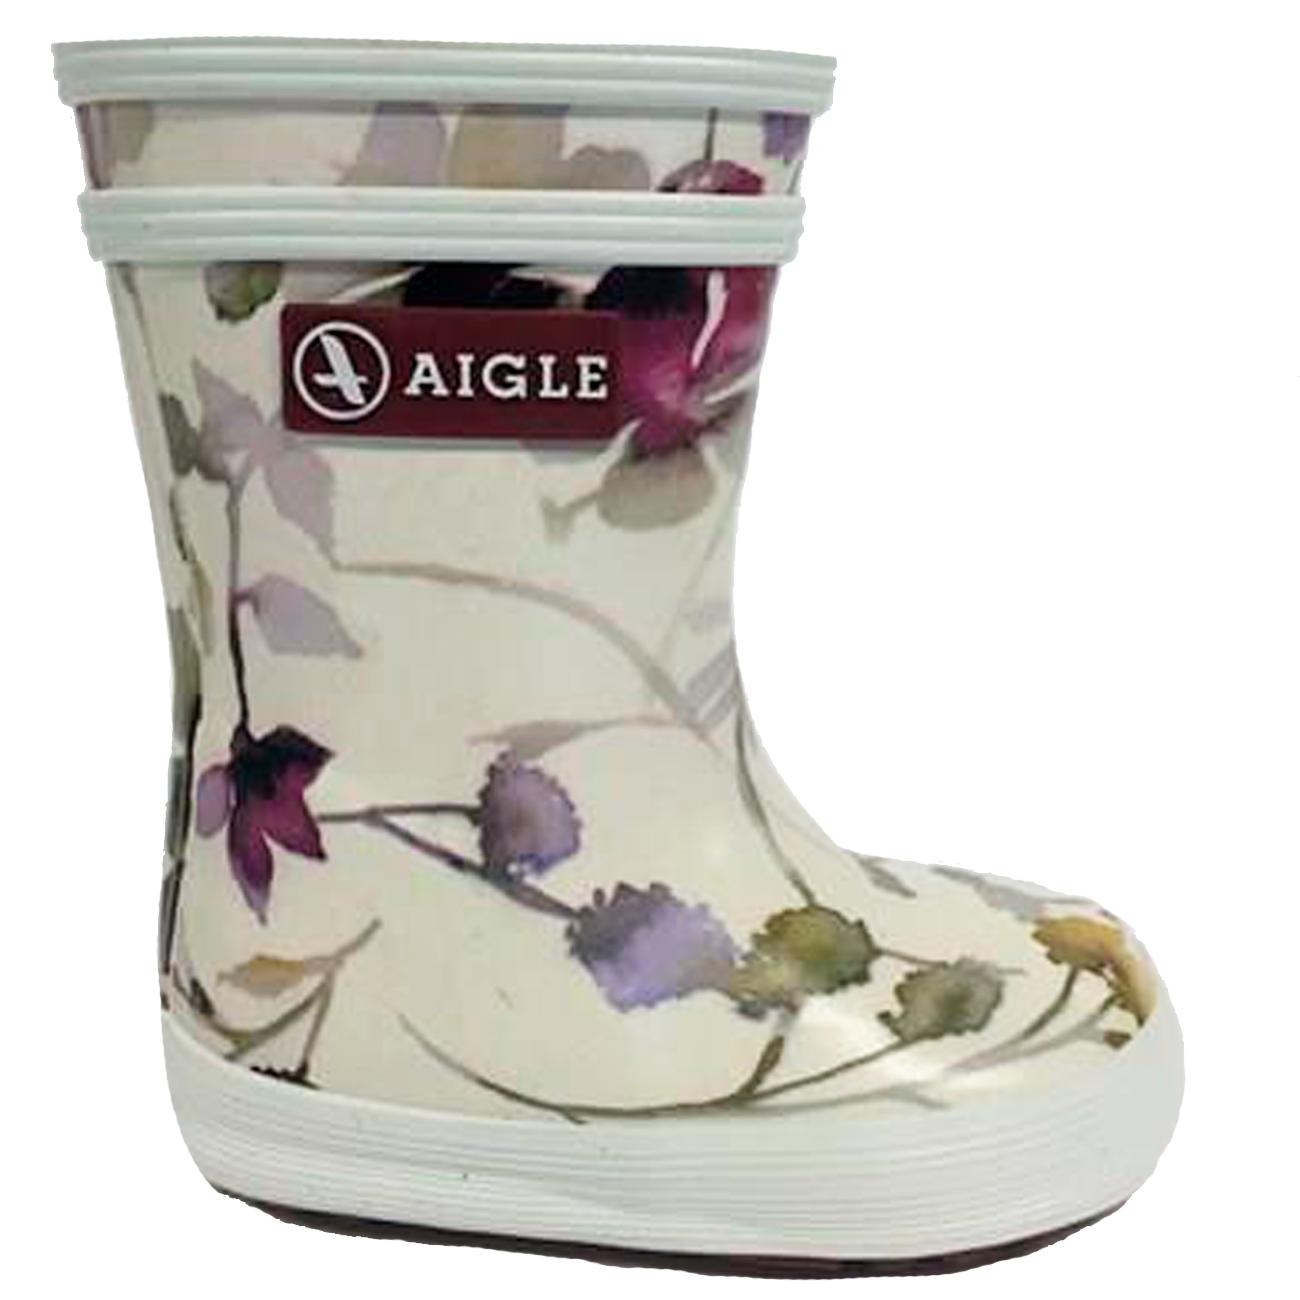 cf8c90e5aea68 Aigle Baby Flac Wellingtons Wildflower